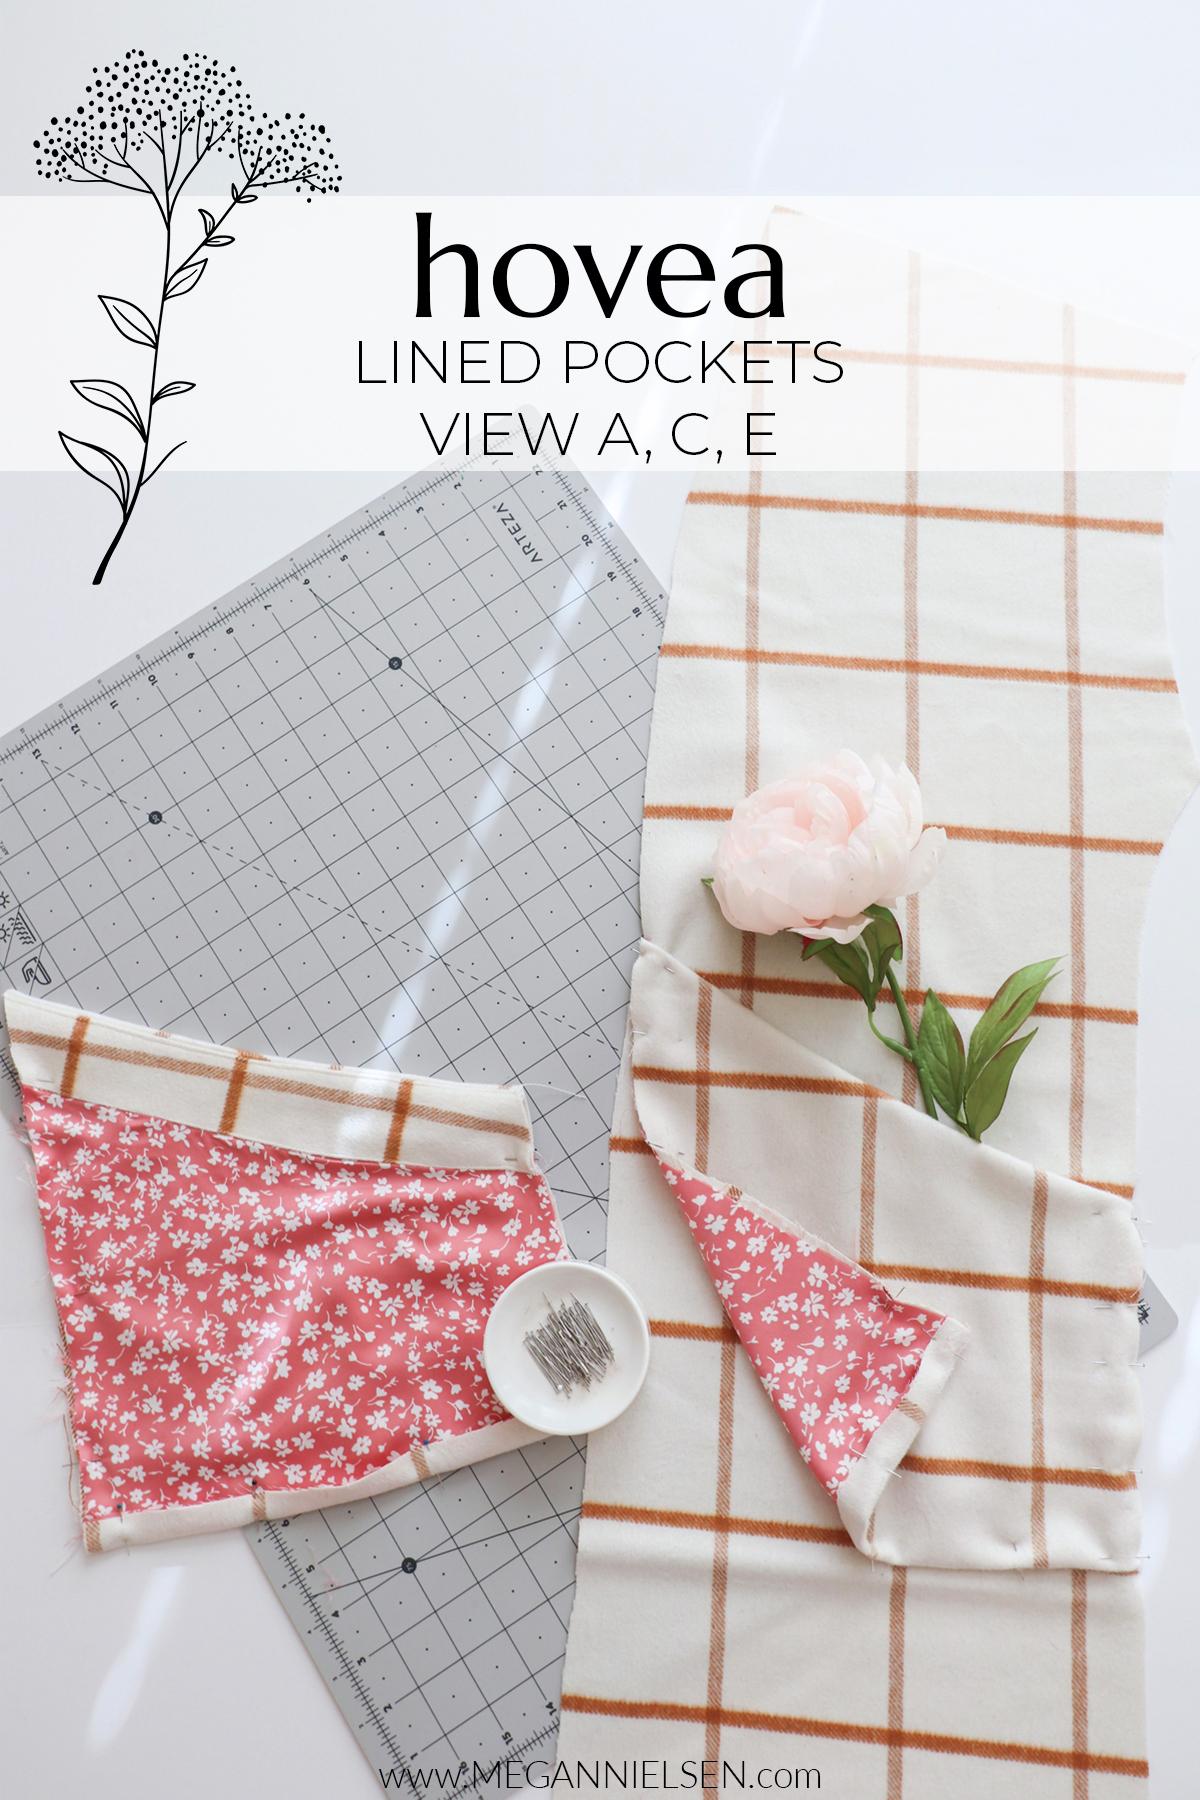 Hovea View A, C & E Lined Pockets